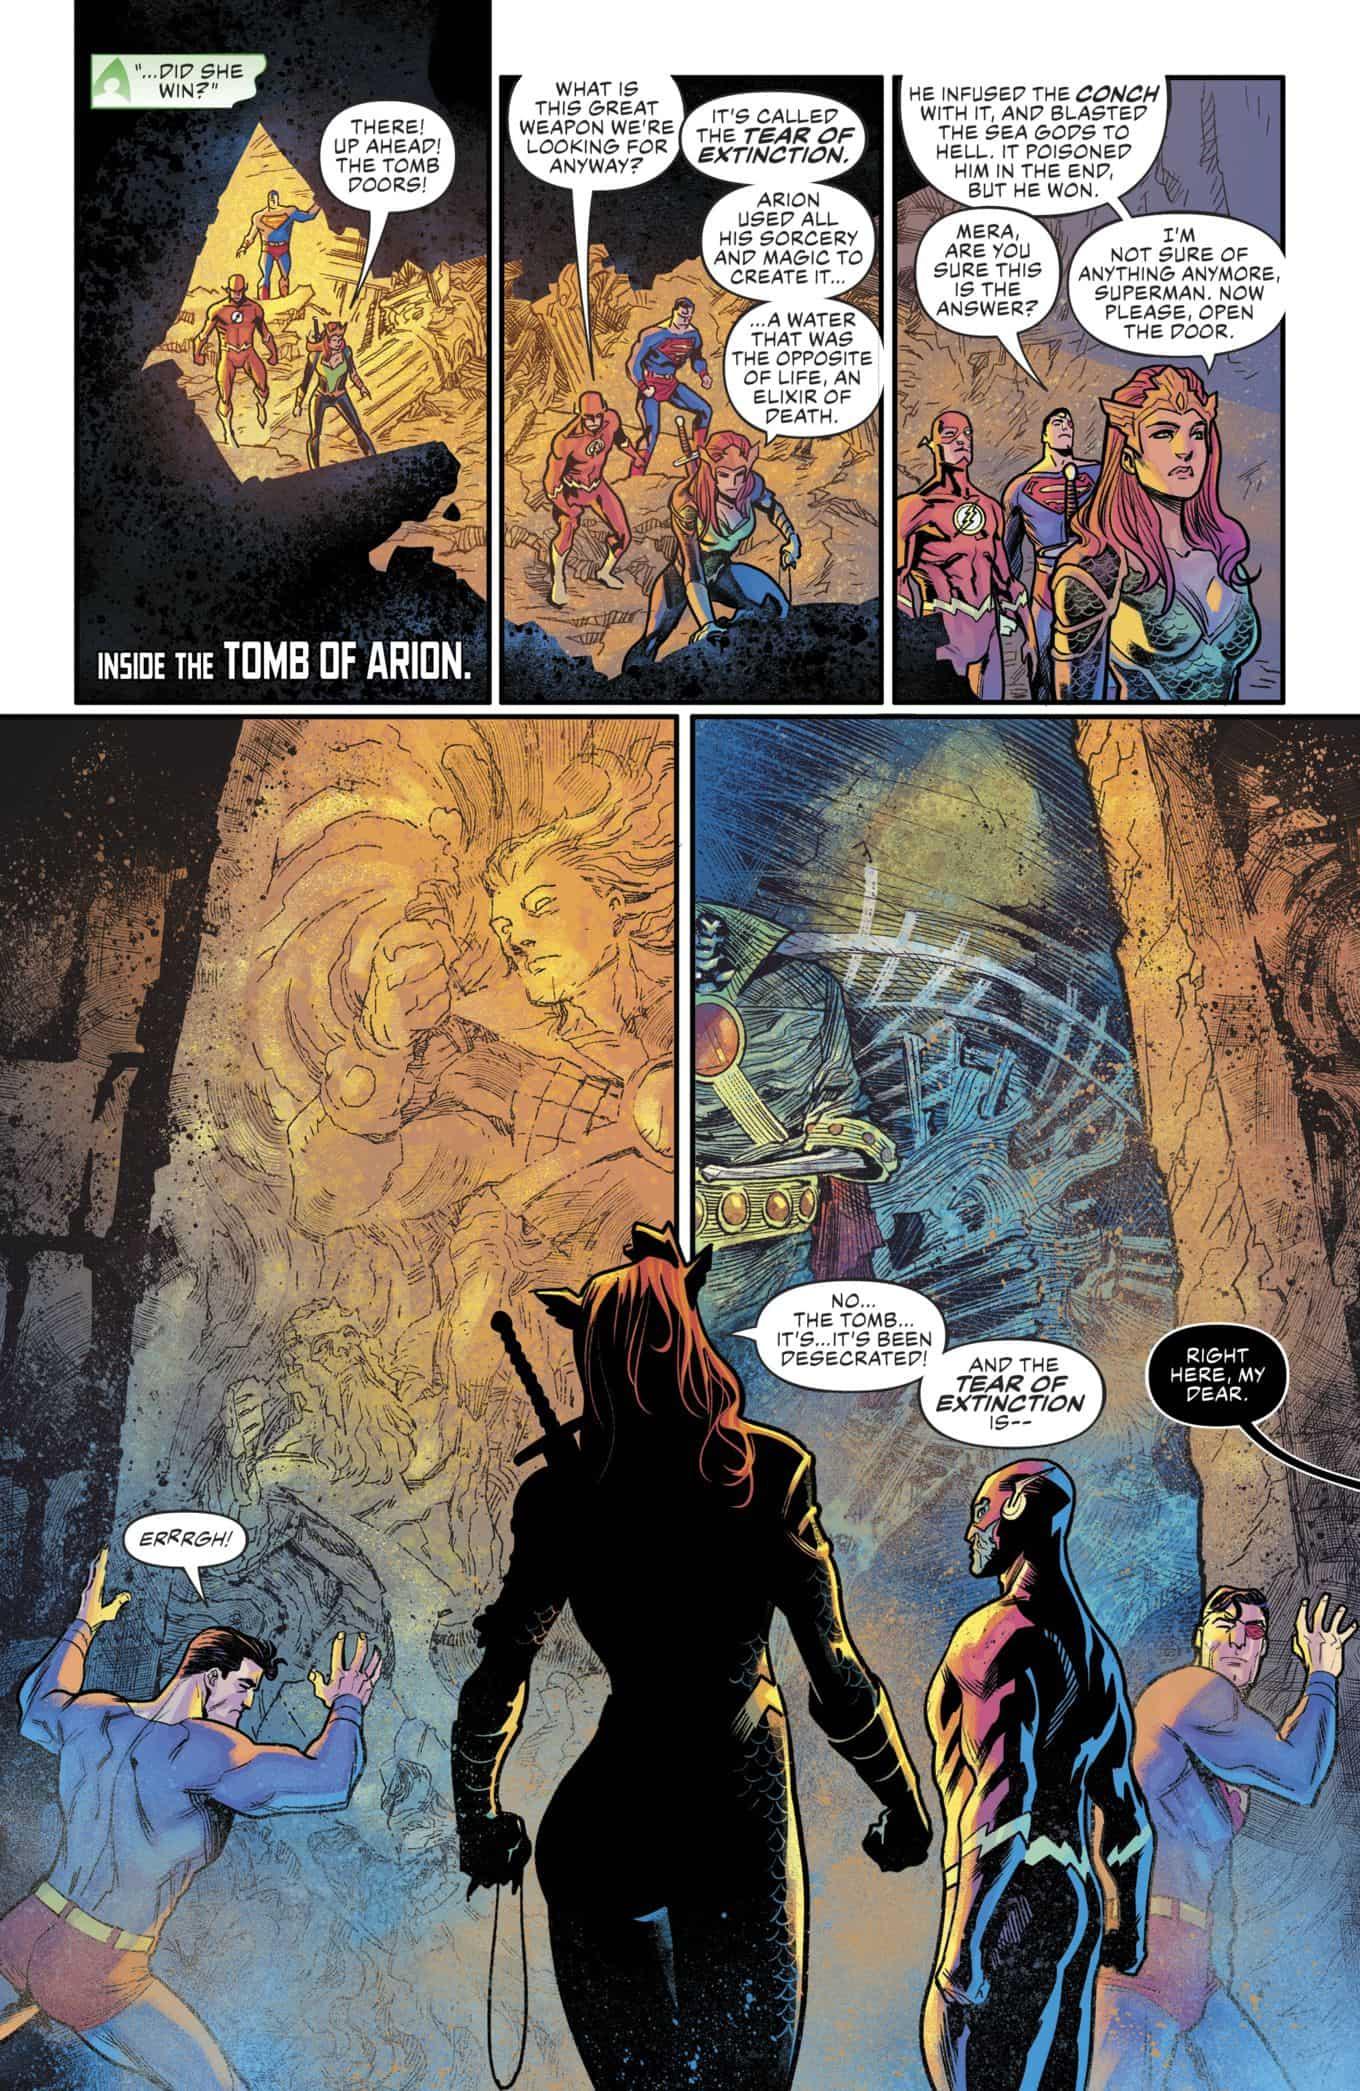 DC Comics Universe & Justice League #11 Spoilers: Drowned Earth Part